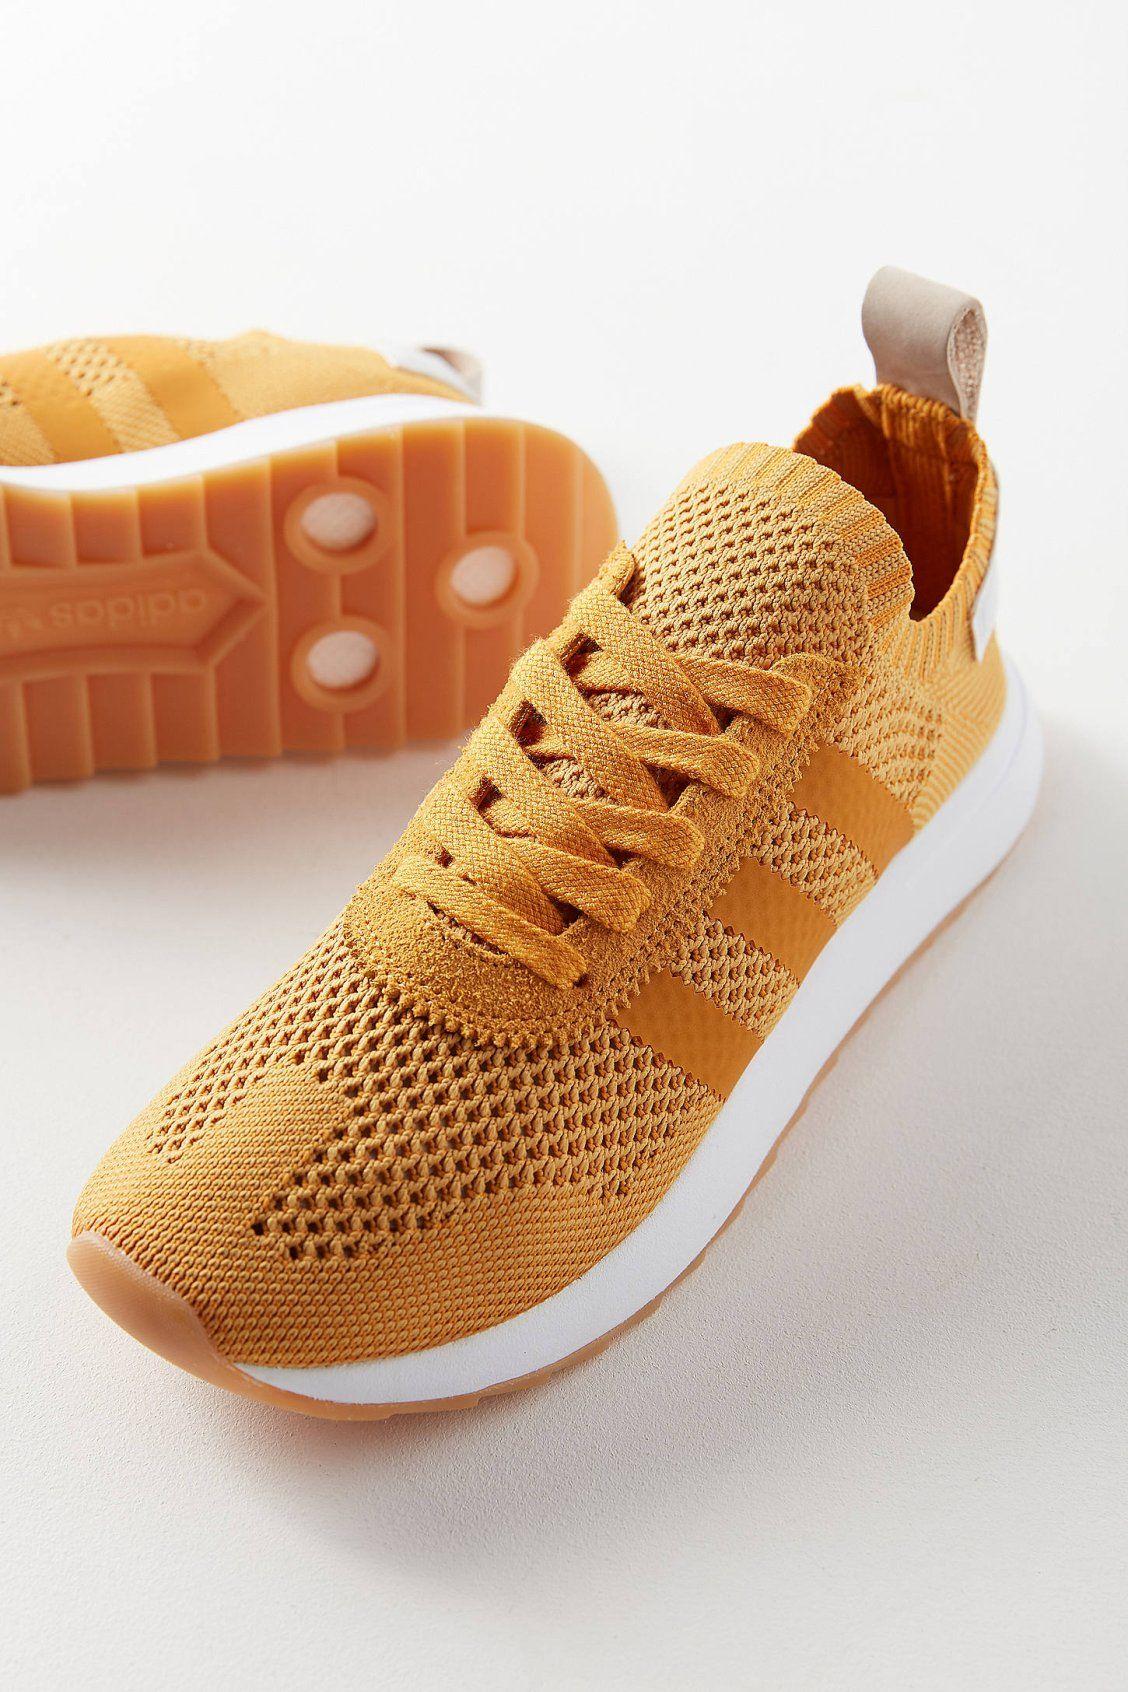 buy online fcb51 d2ebb adidas Originals Flashback Primeknit Sneaker  Urban Outfitters